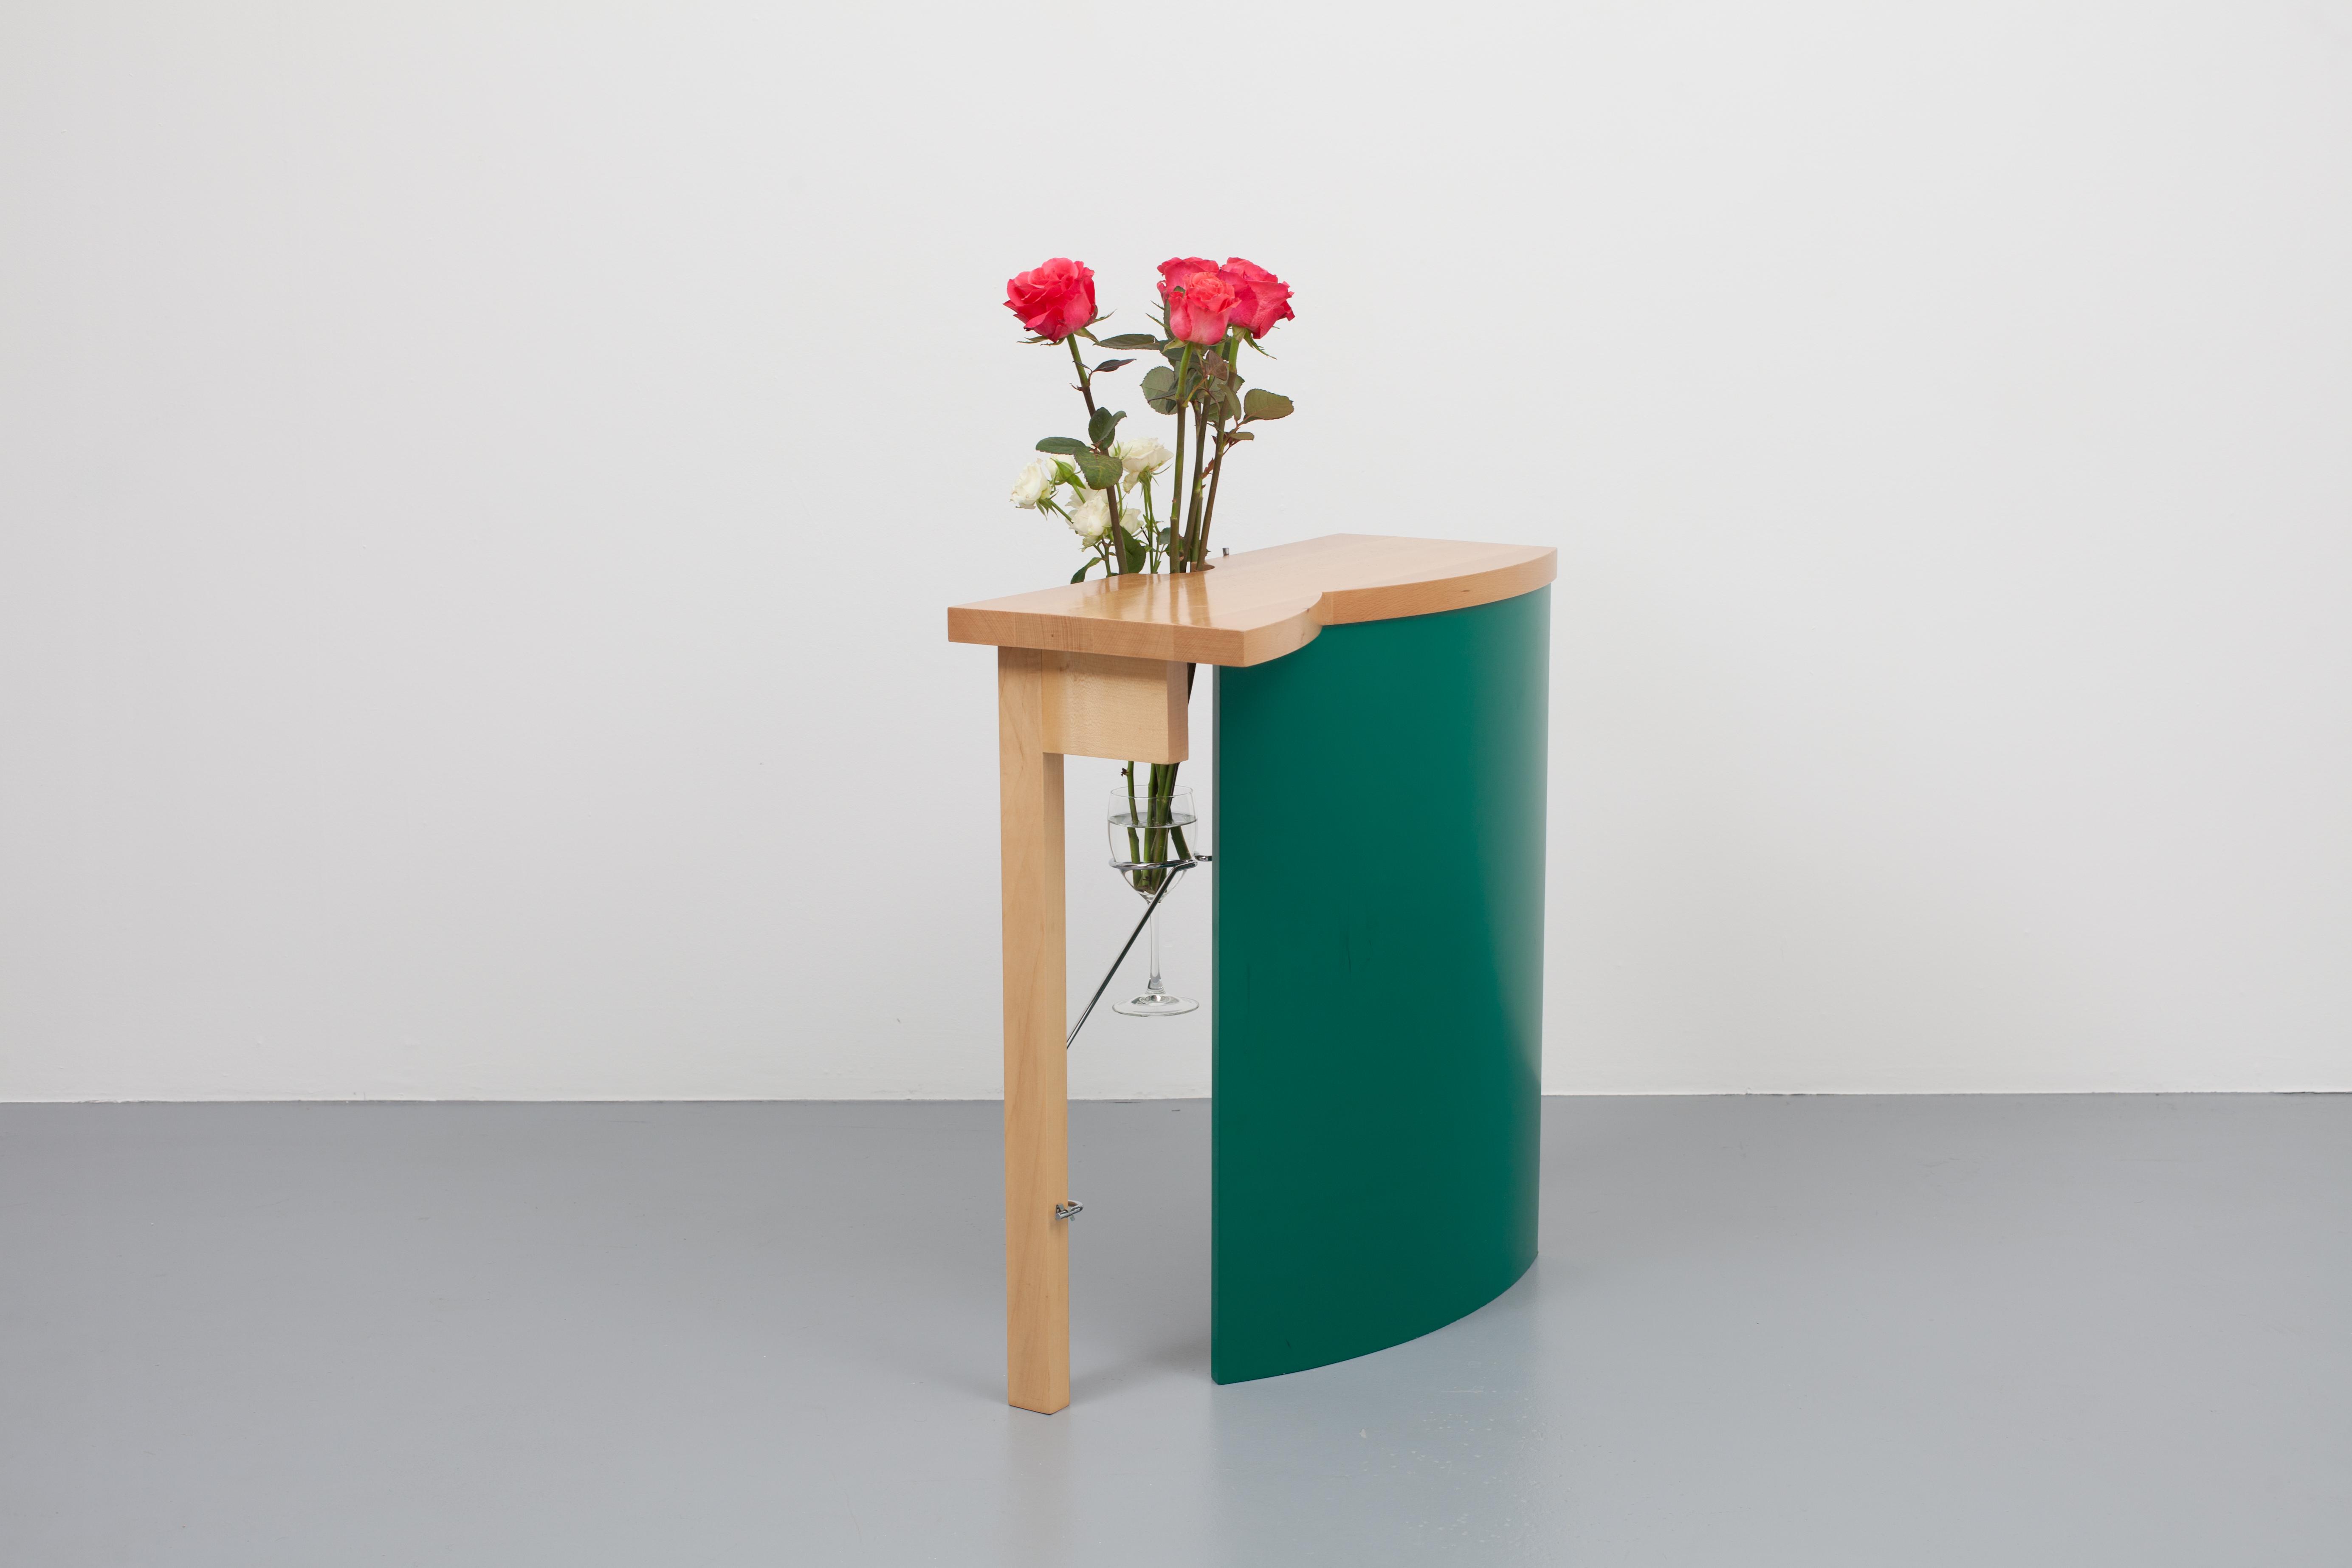 http://a1043.com/wp-content/uploads/Daniel-Weil-Table-Vase_003.jpg